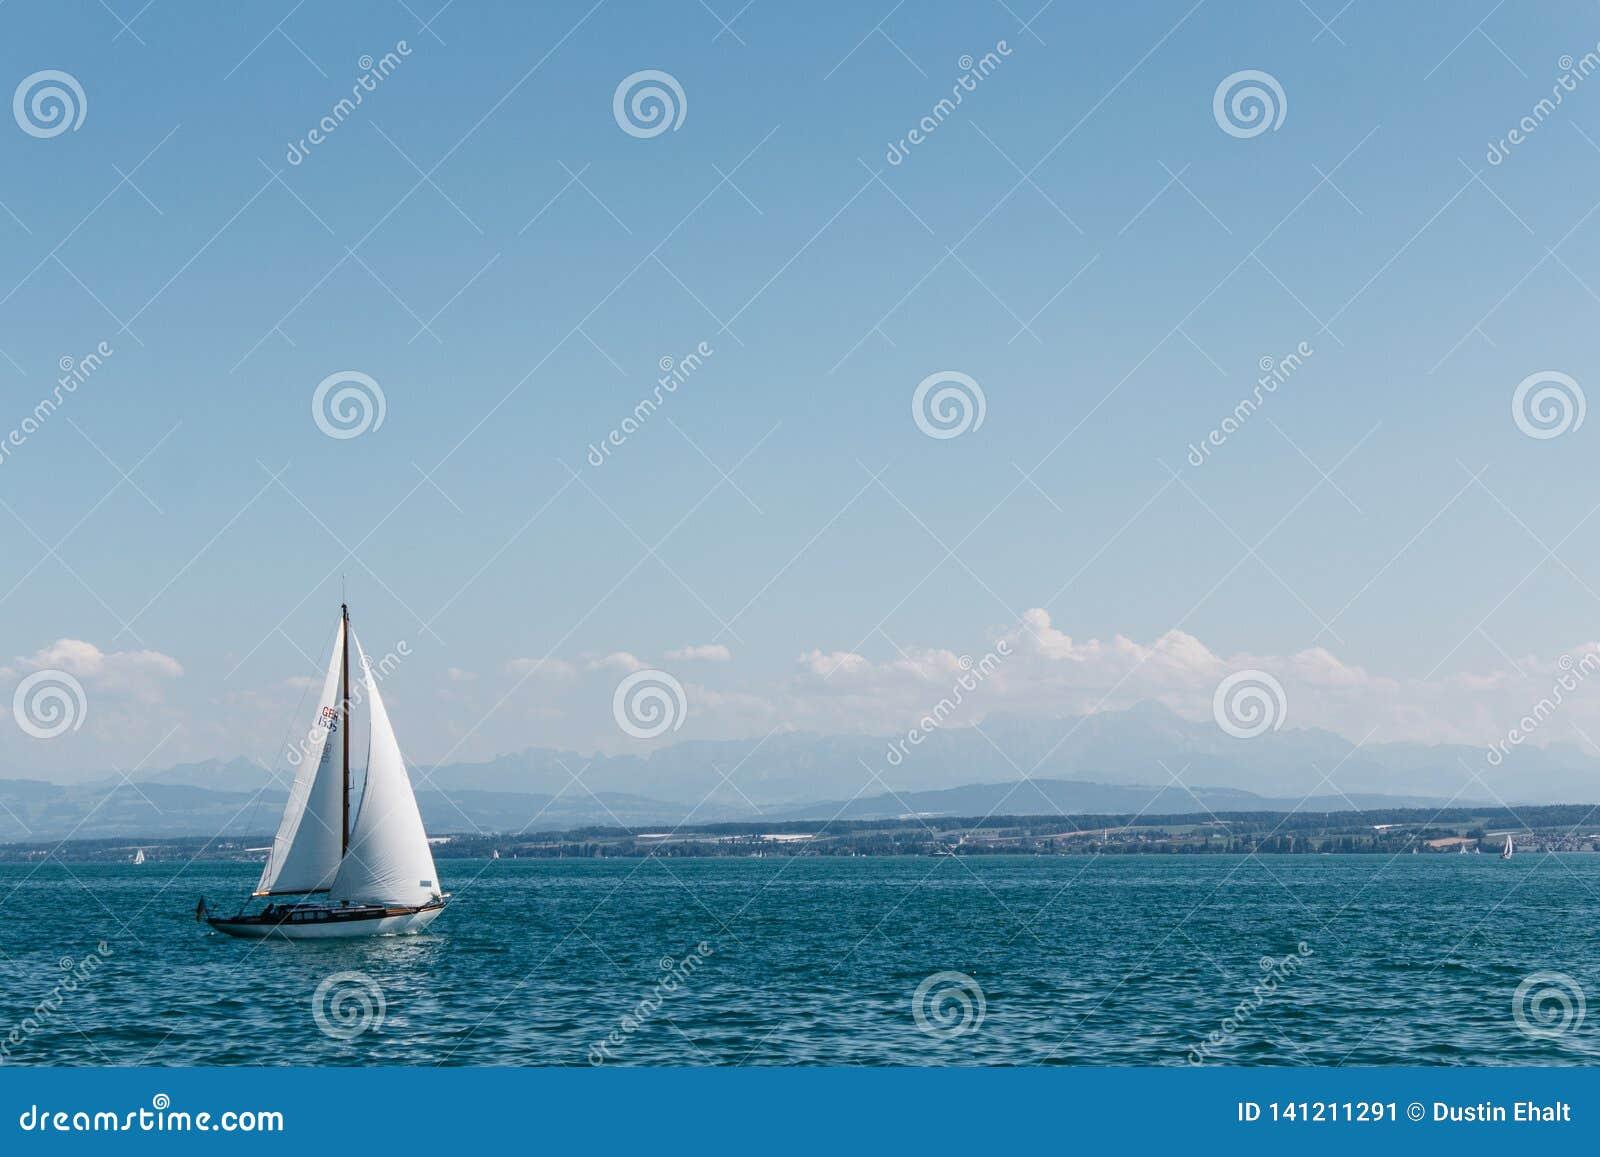 Sailing on the sea under blue skies